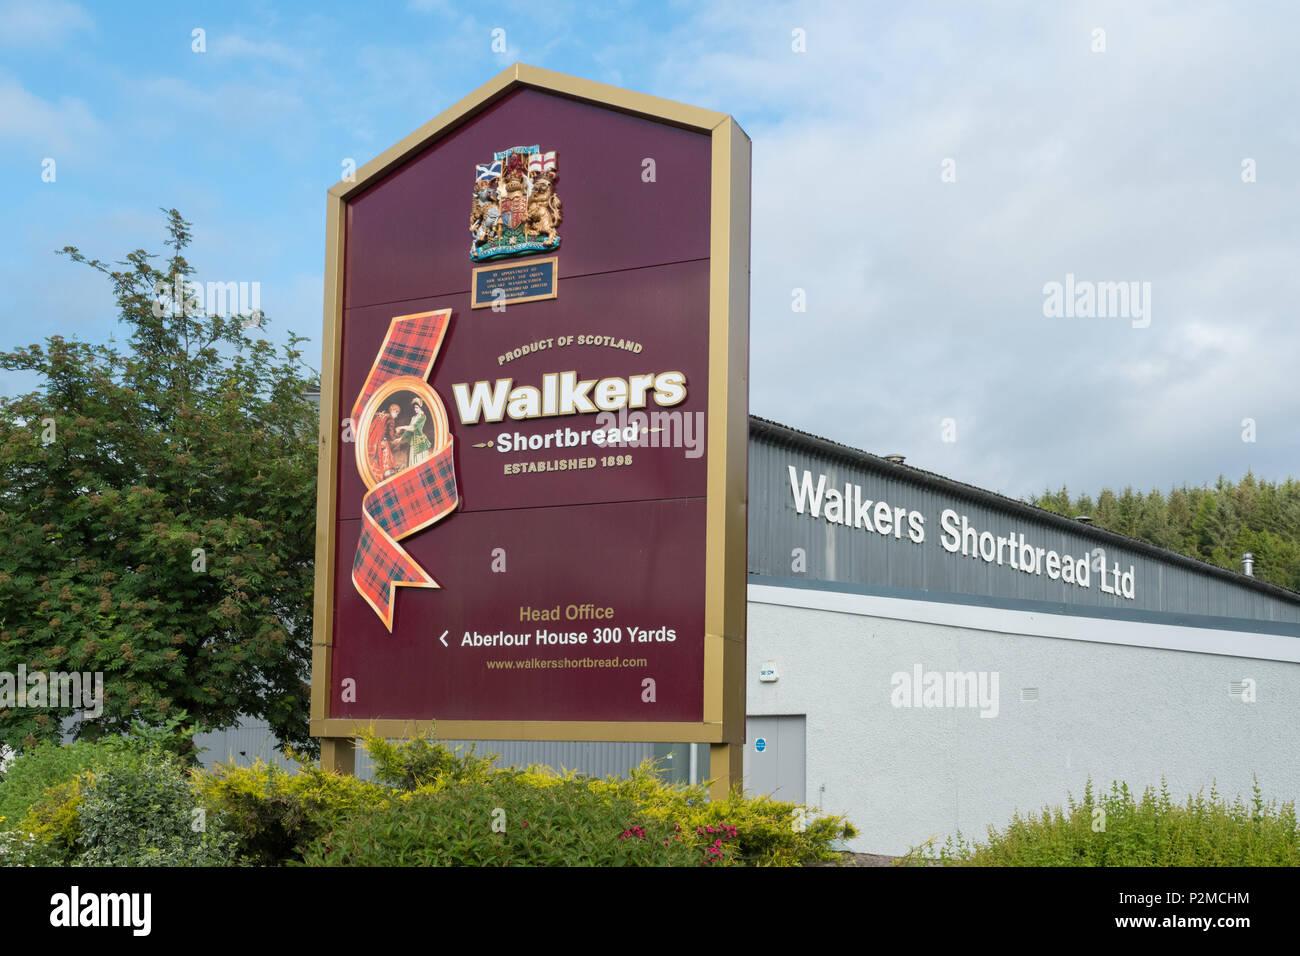 Walkers Shortbread factory, Aberlour, Scotland, UK - Stock Image